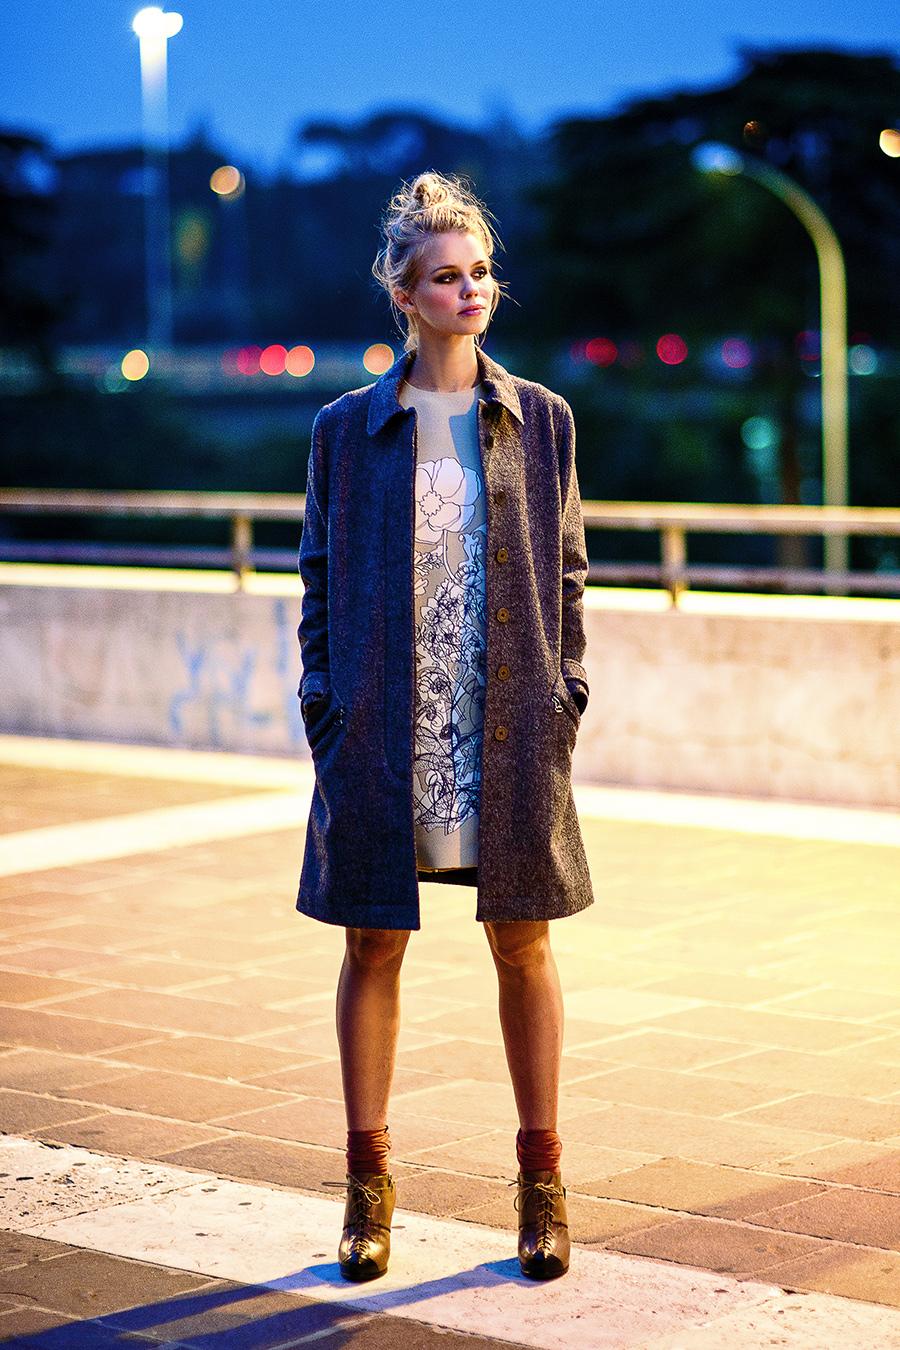 Fashion Editorial - Olga Eur